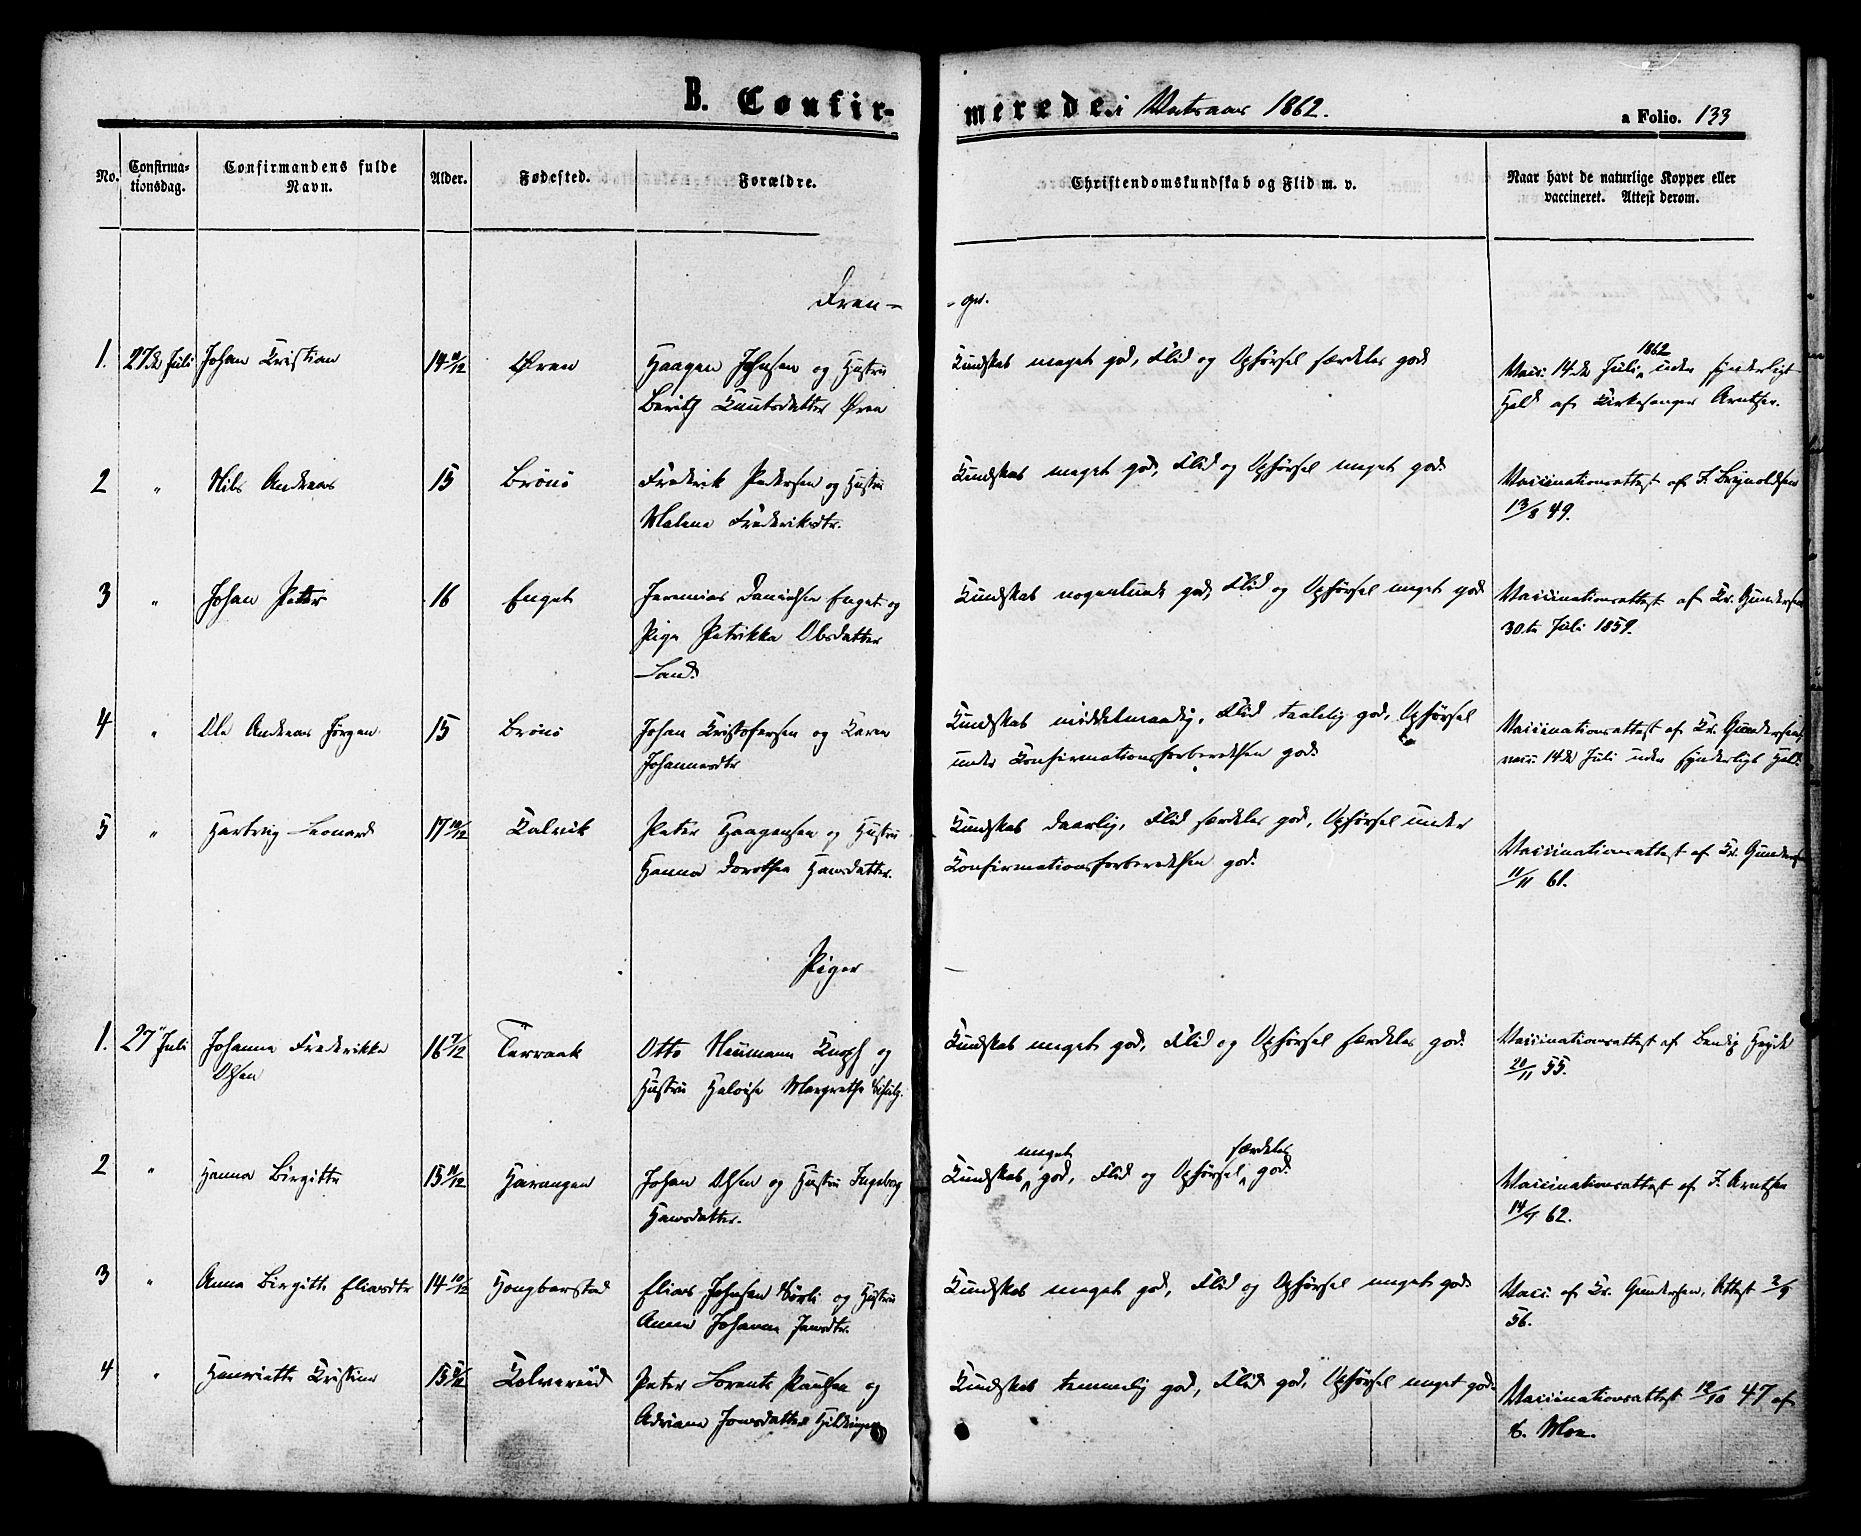 SAT, Ministerialprotokoller, klokkerbøker og fødselsregistre - Nordland, 810/L0146: Ministerialbok nr. 810A08 /1, 1862-1874, s. 133